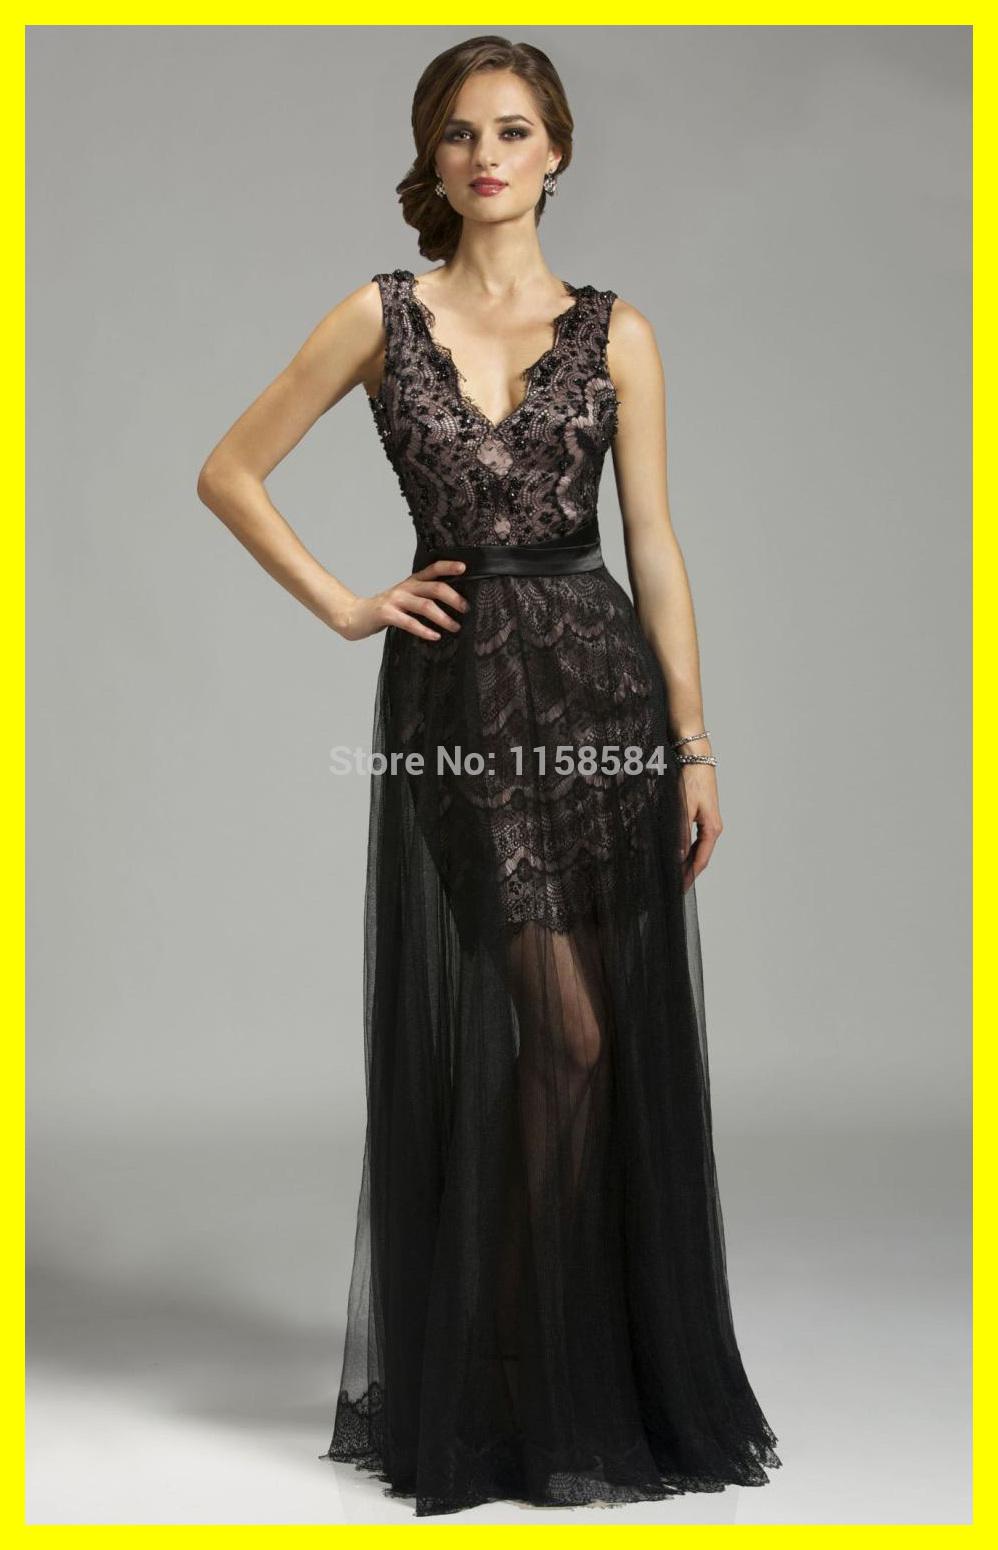 Pregnancy Evening Dresses Online - Prom Dresses Vicky